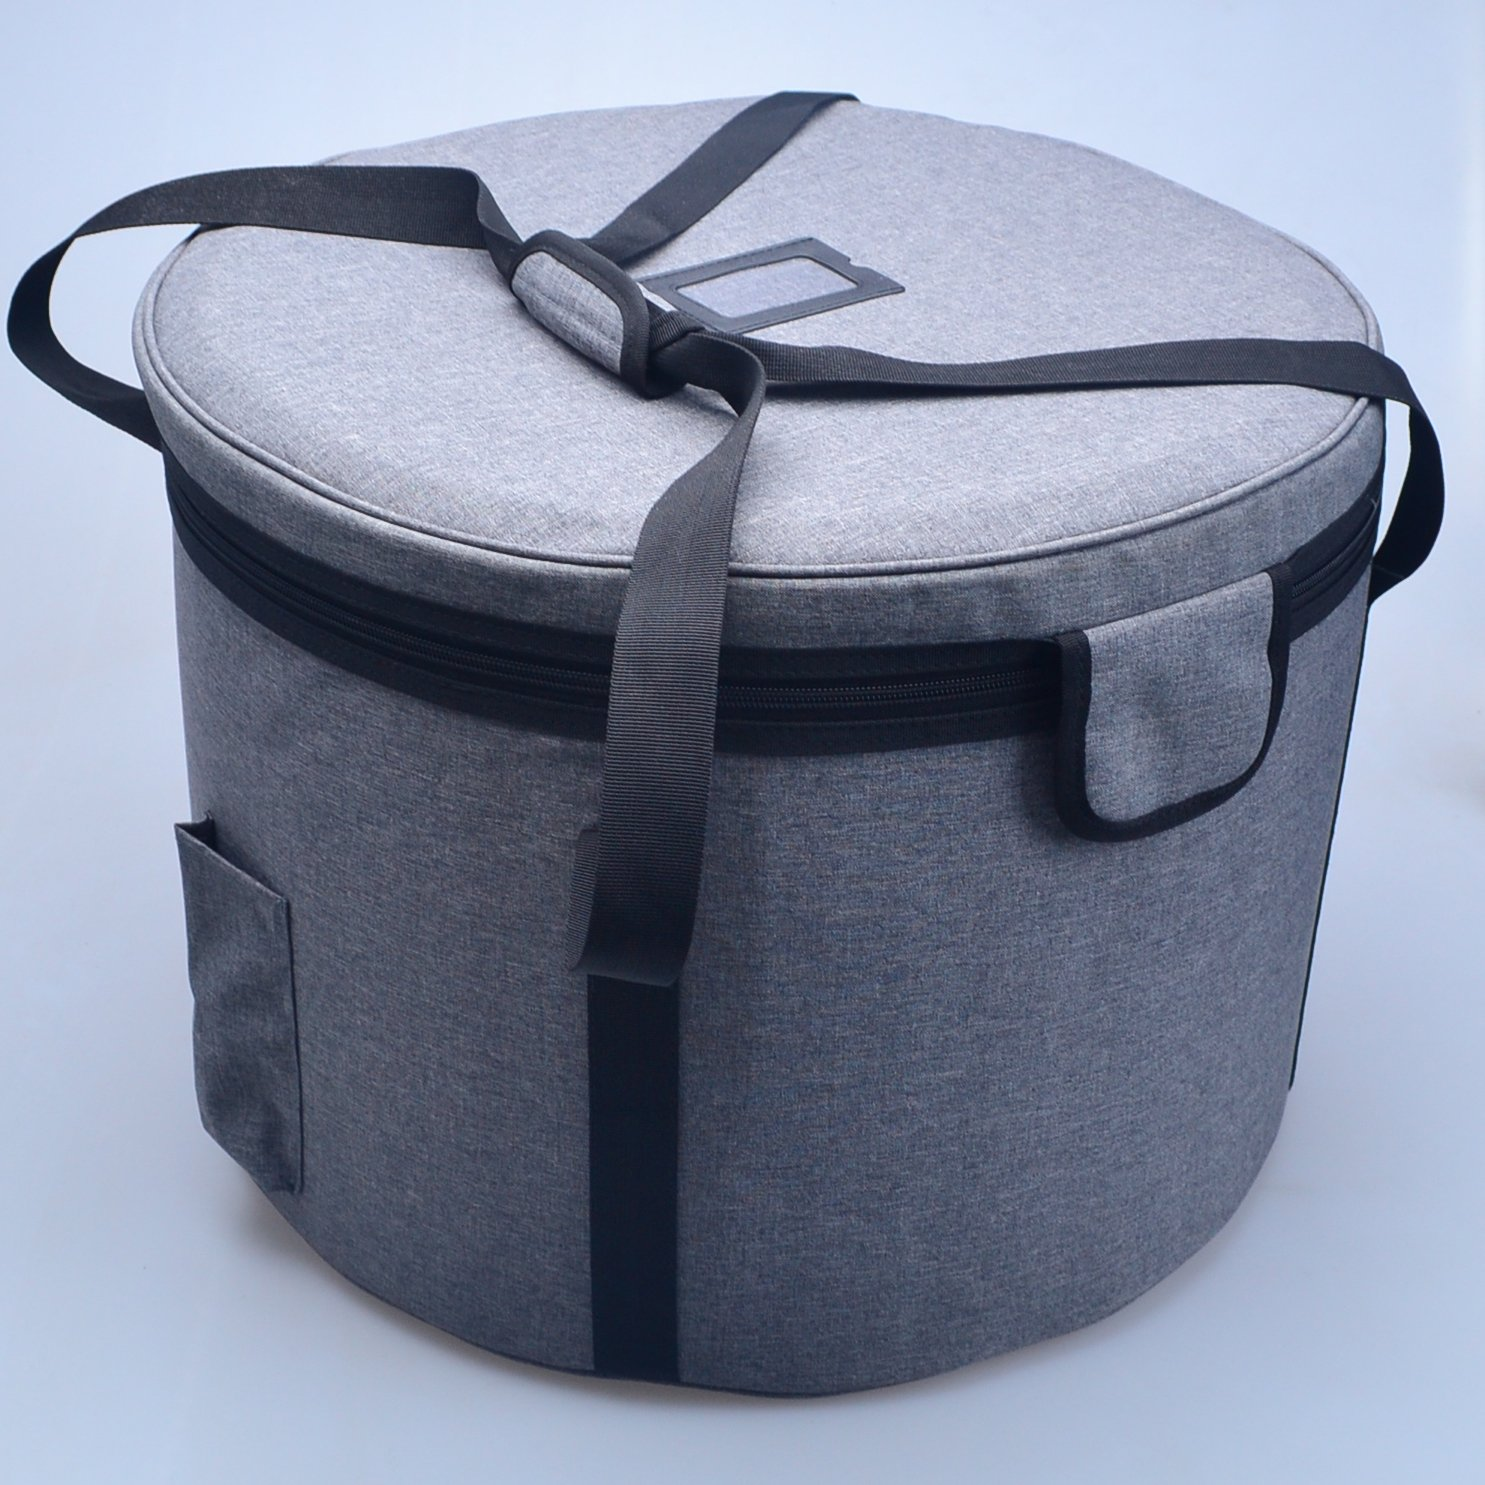 Crystal Singing Bowl Carry Case Travelling Bag For Size 12''